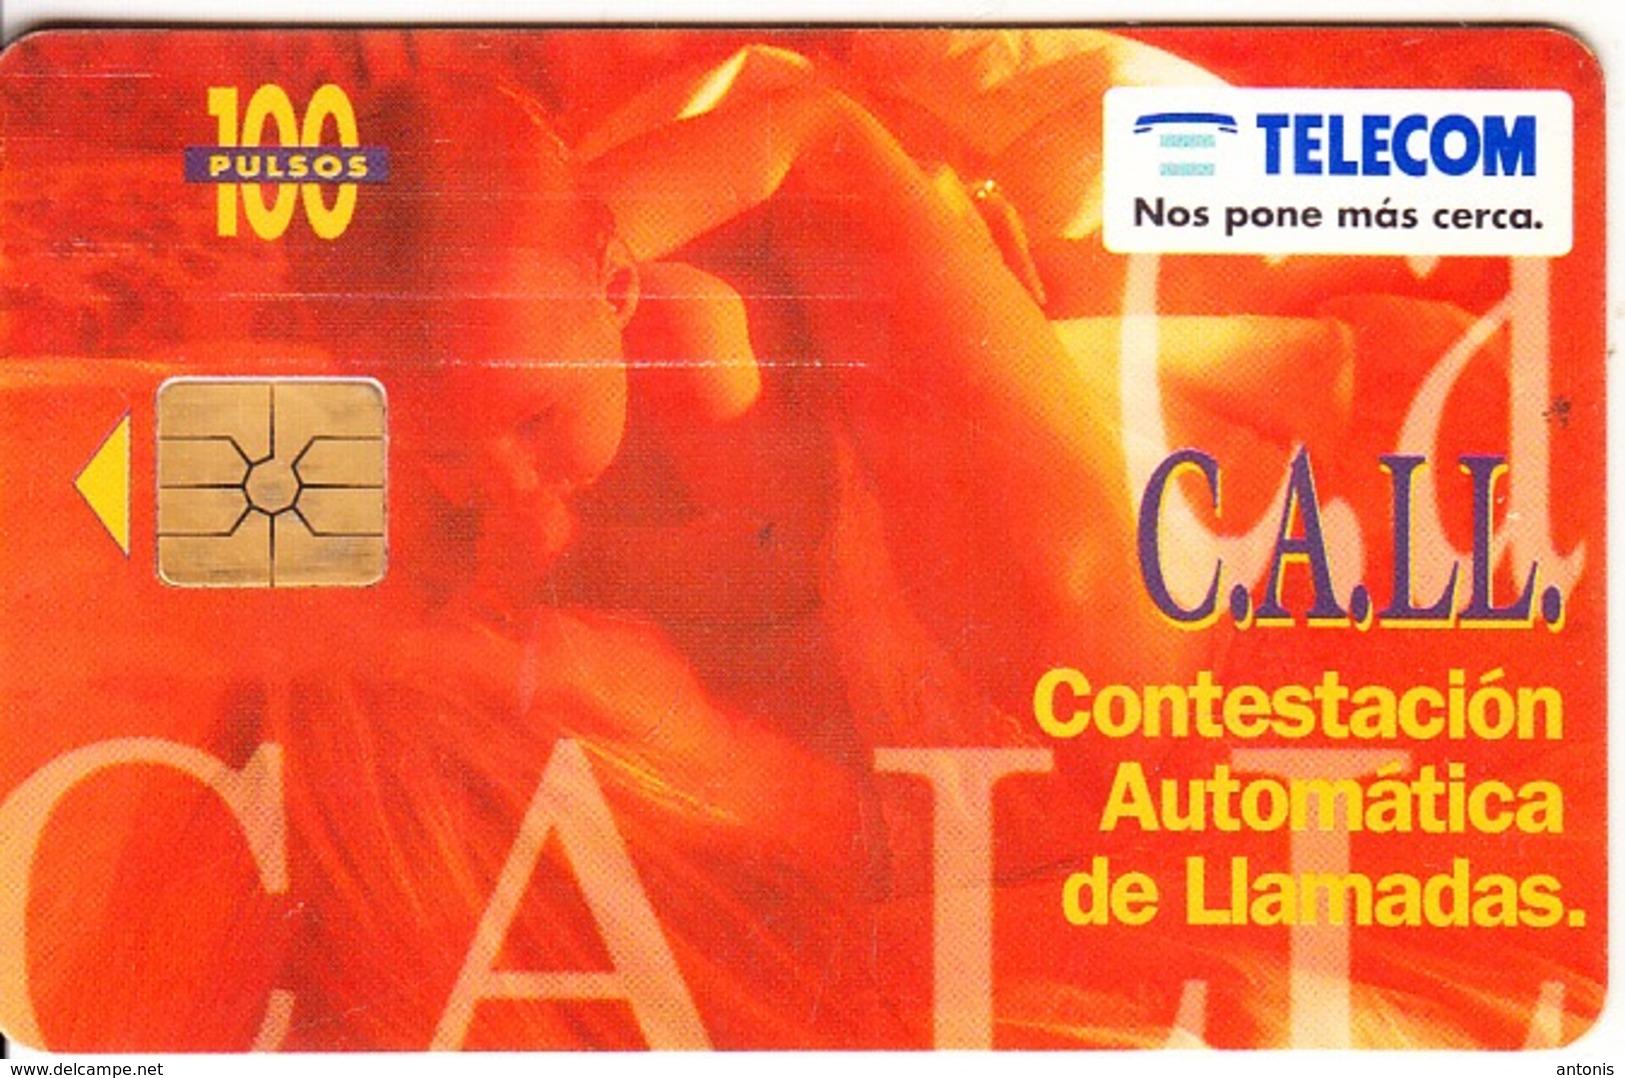 ARGENTINA - C.A.LL., Telecom Argentina Telecard, Chip GEM1a, 06/96, Used - Argentinien